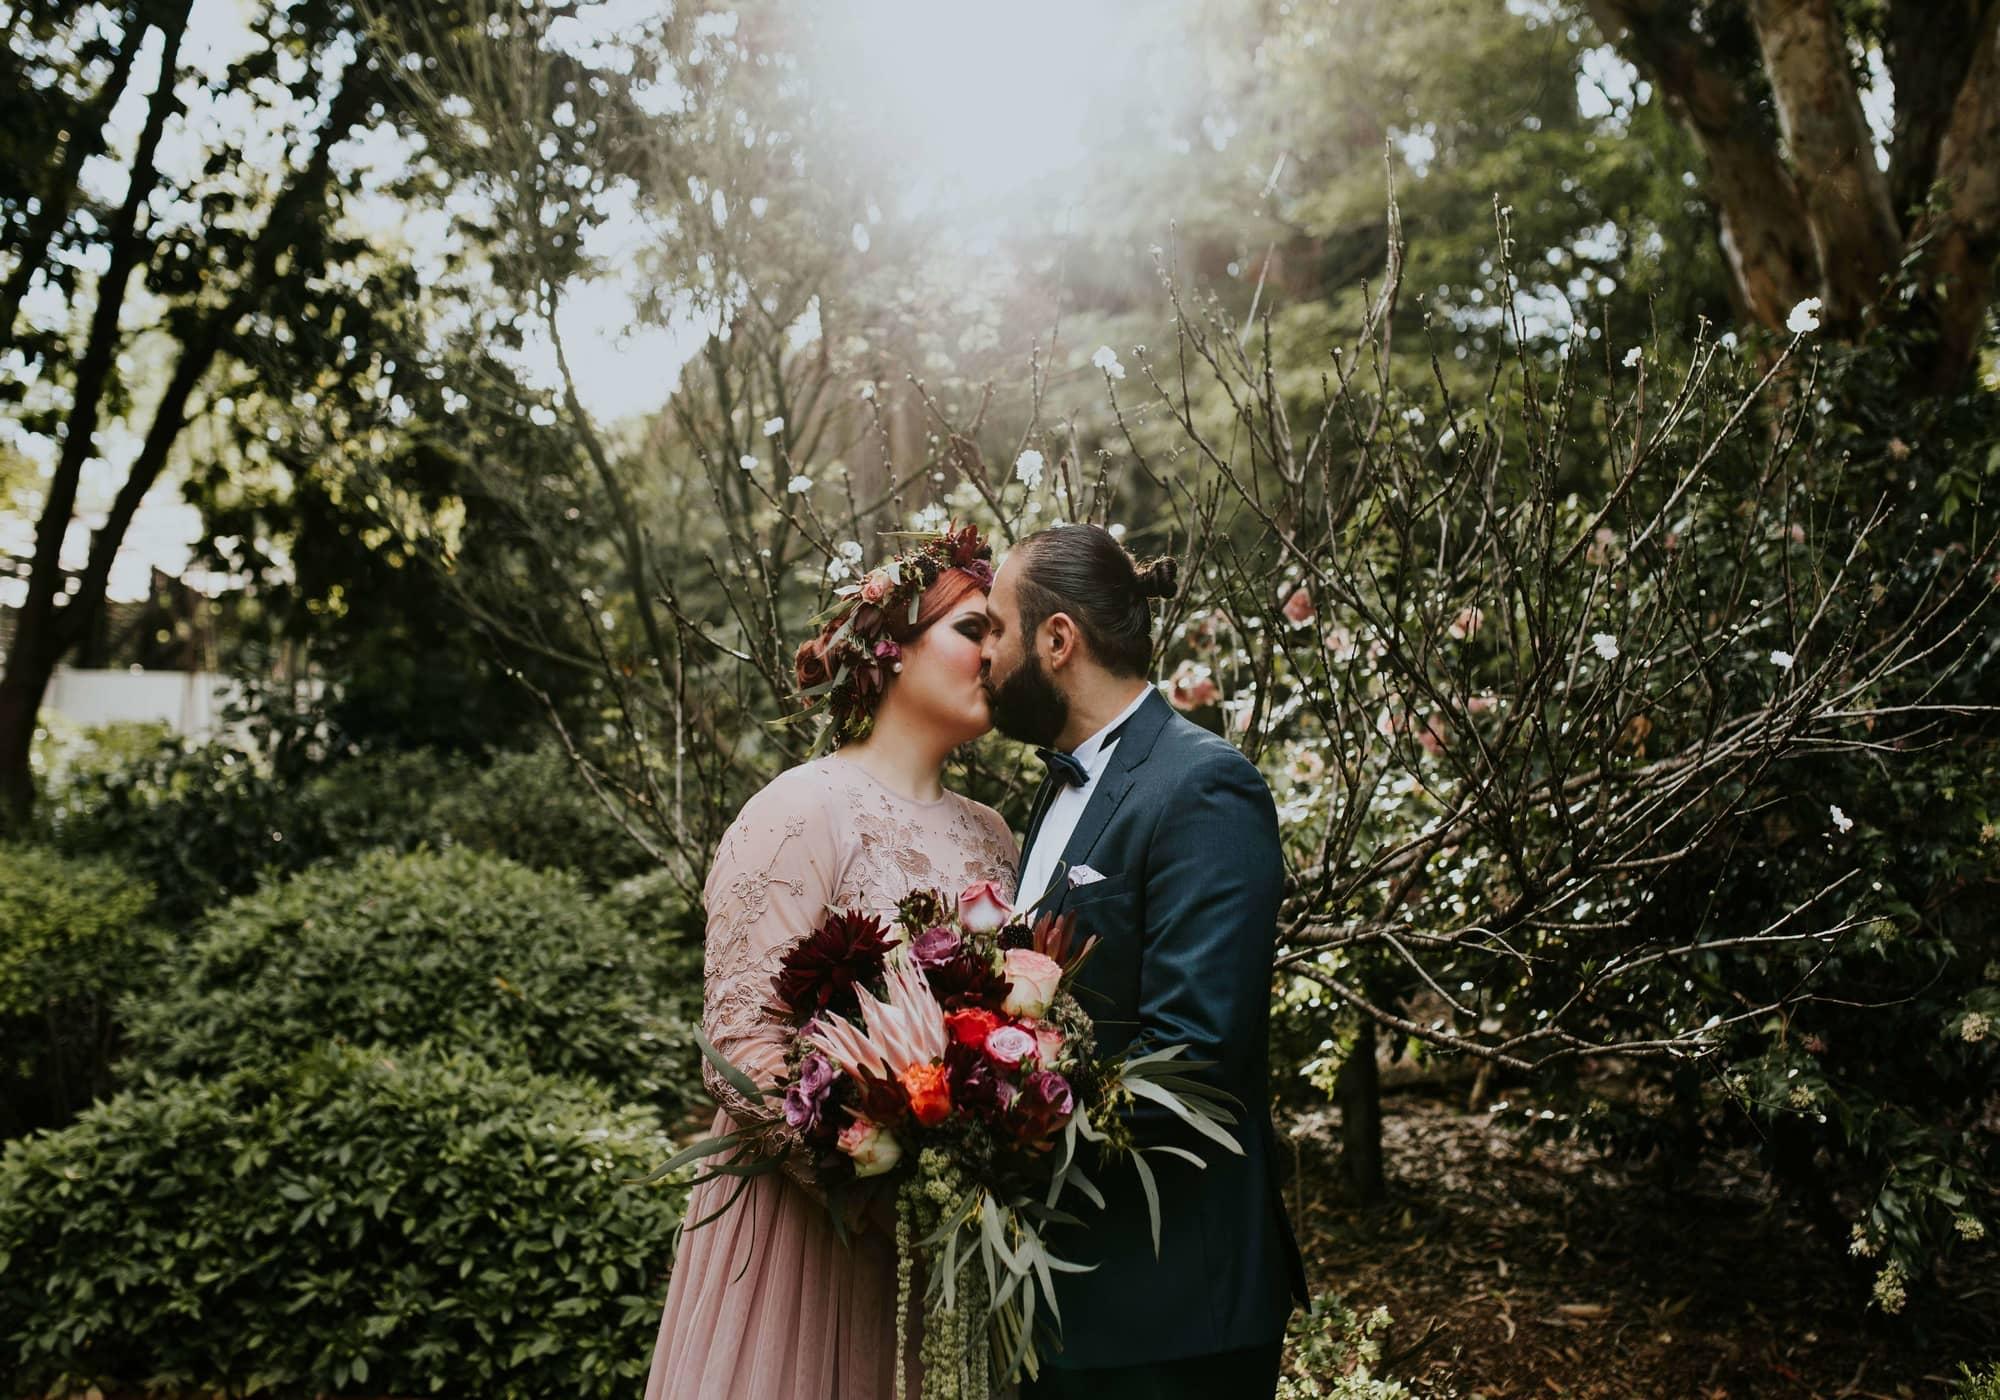 Brisbane-Wedding-Photographer-Natalie-Skoric-16.jpg